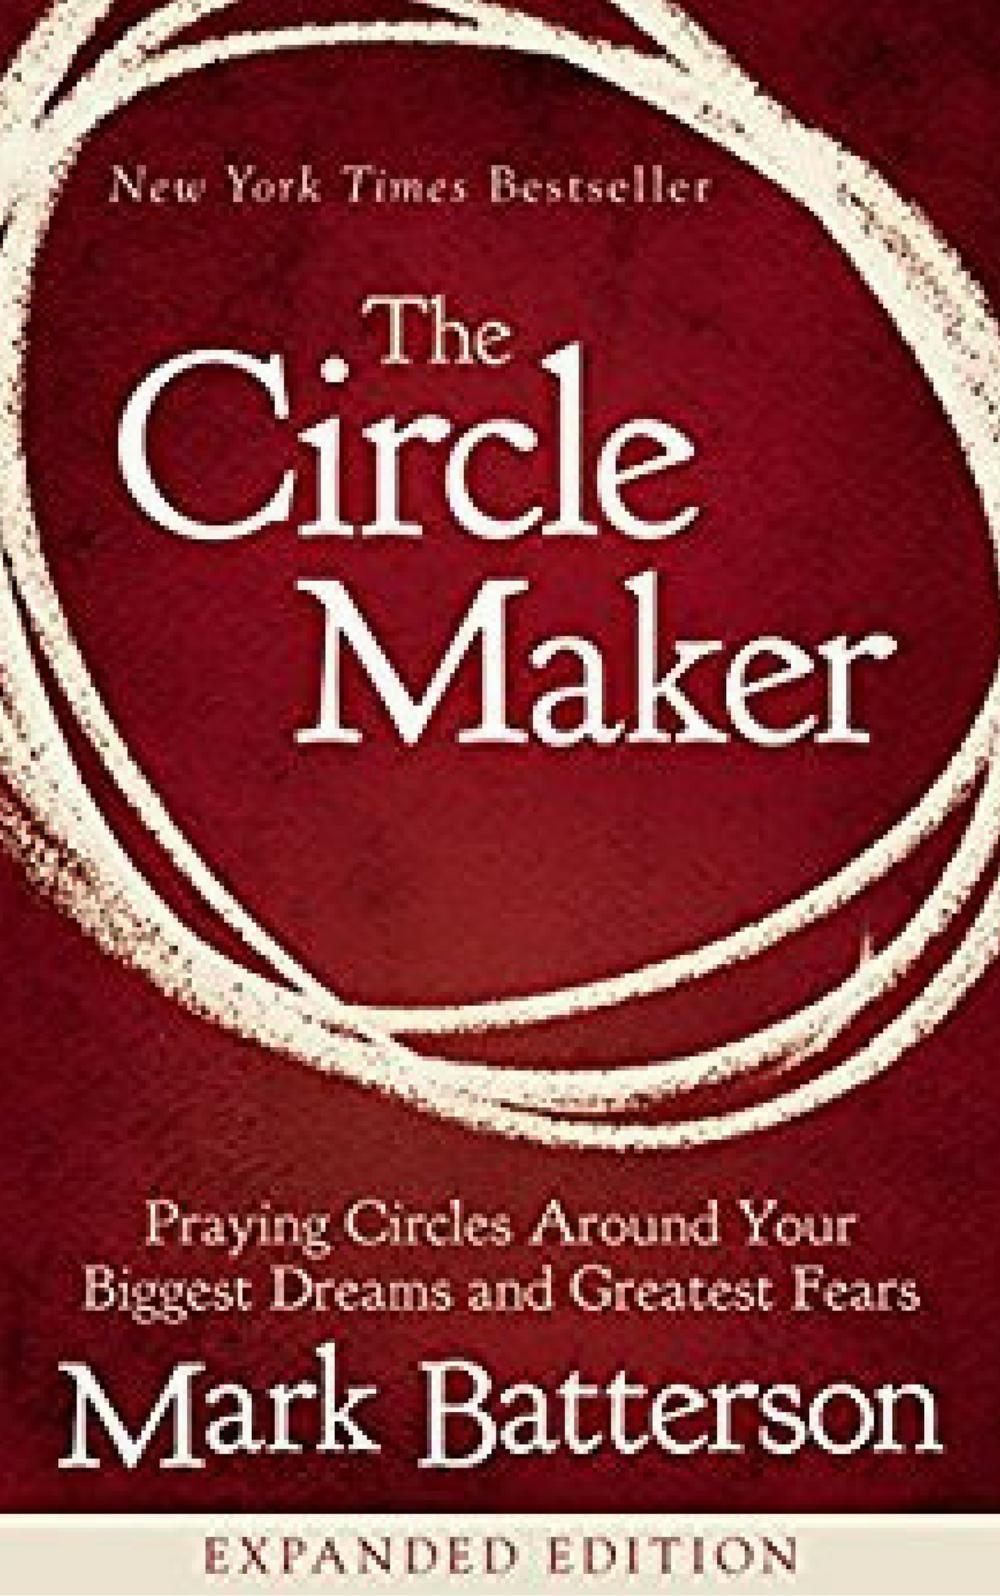 The-Circle-Maker.jpg